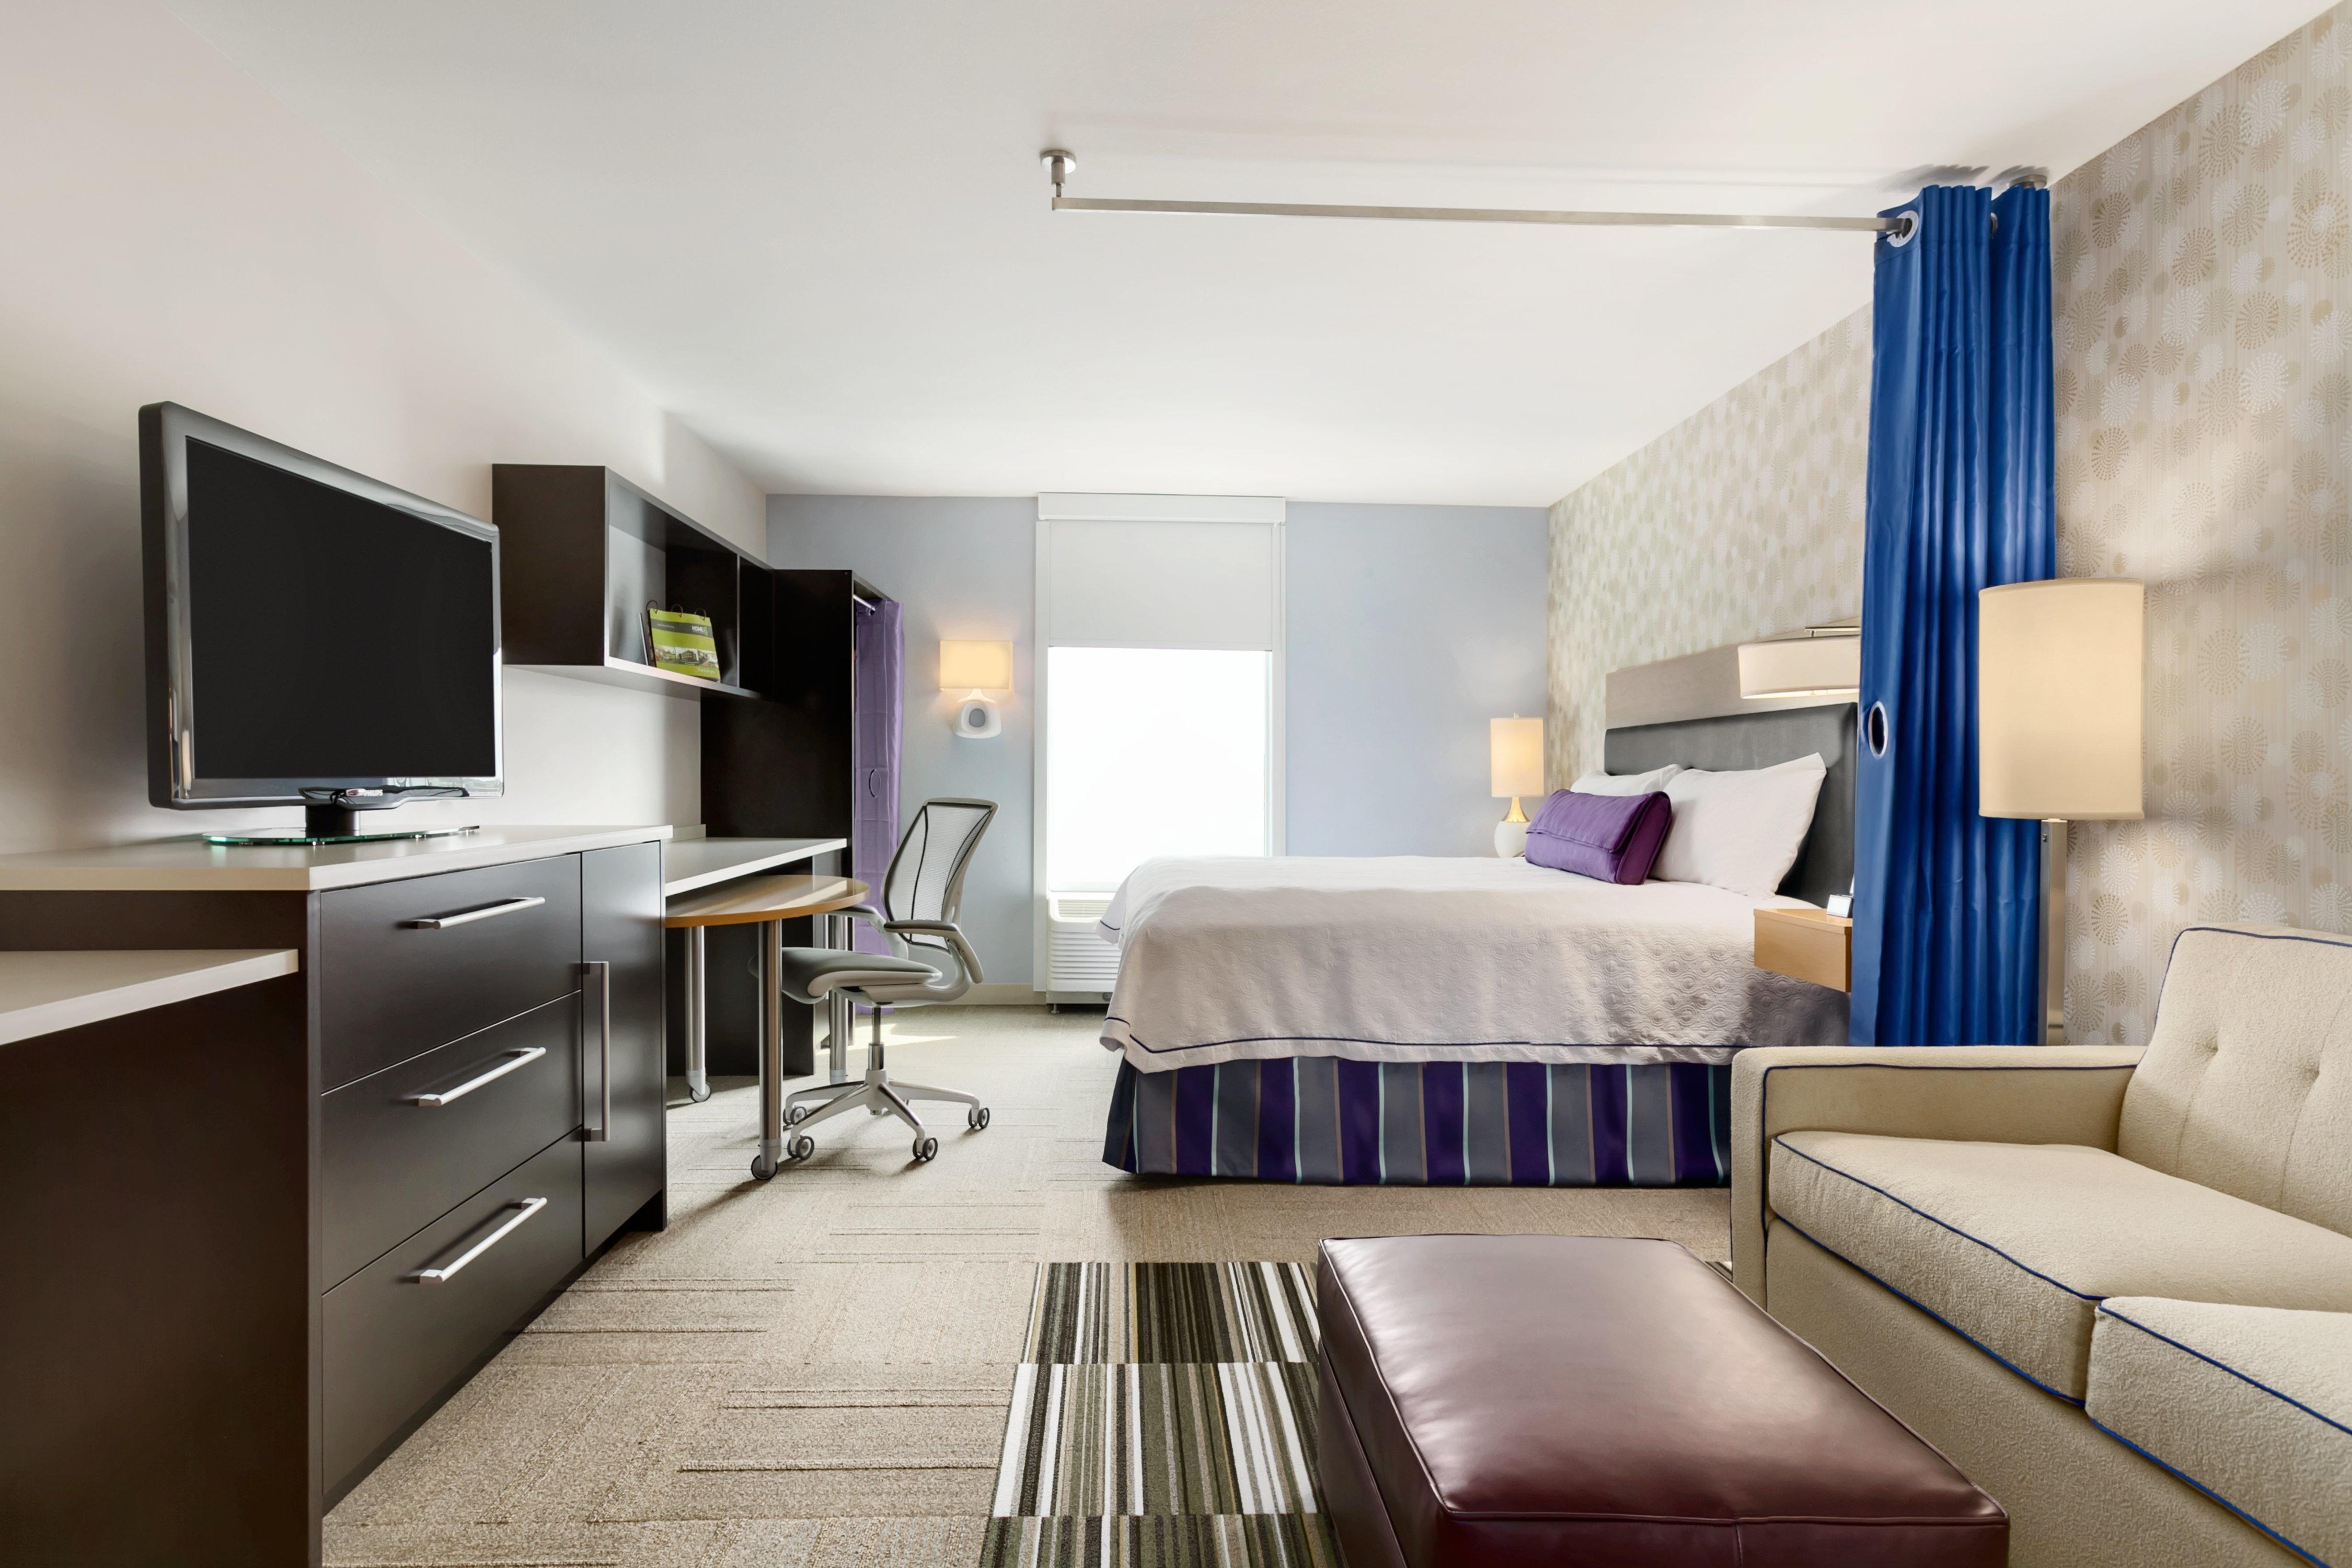 Home2 Suites By Hilton Anchorage  Midtown  Anchorage Alaska